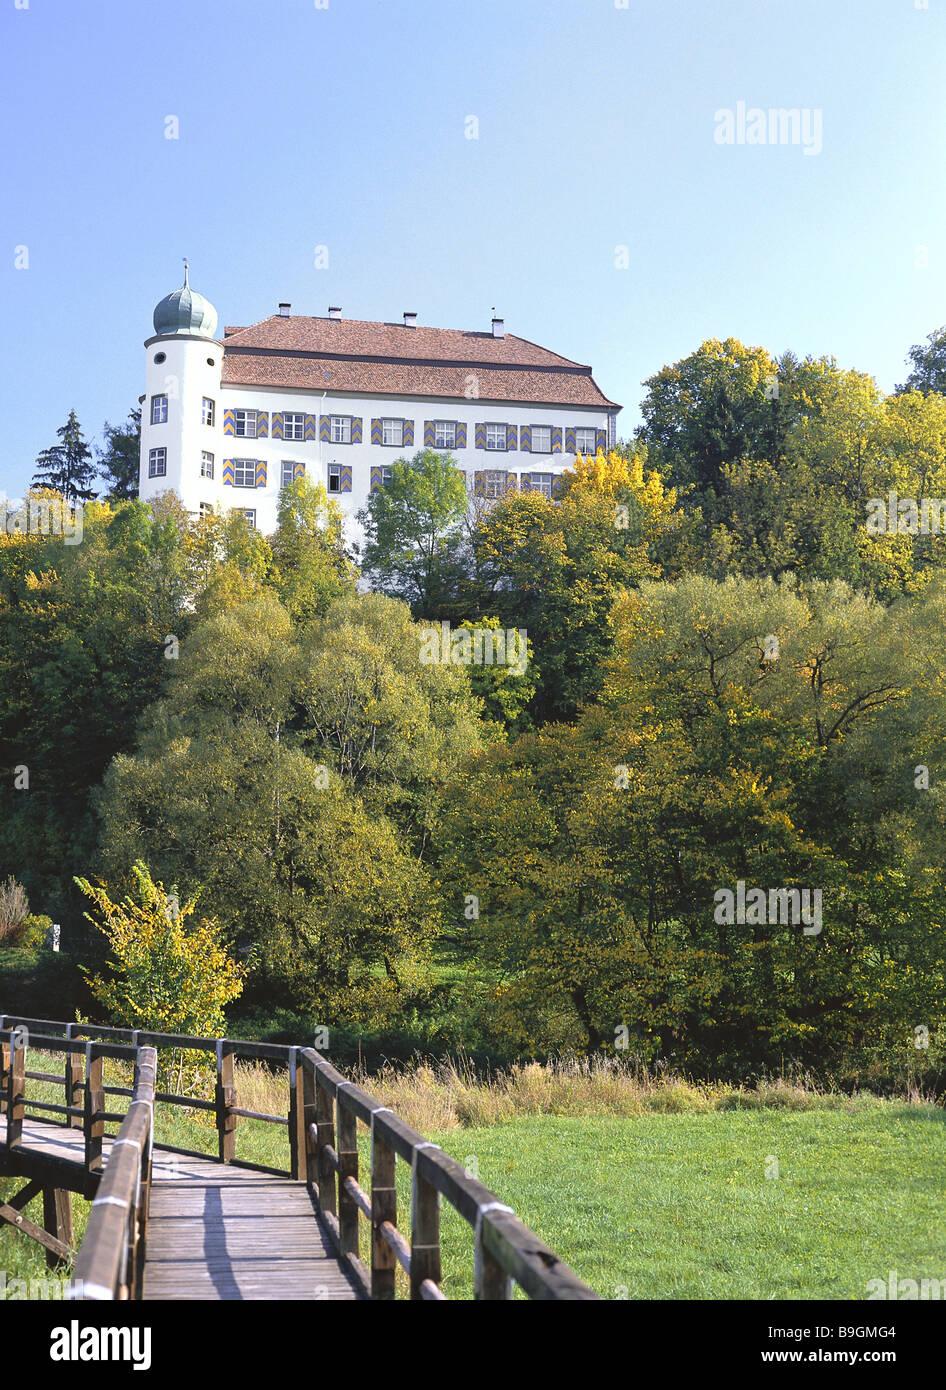 Germany  Baden-Württemberg  Mühlheim on the Danube  palace Mühlheim forest meadow bridge autumn  - Stock Image